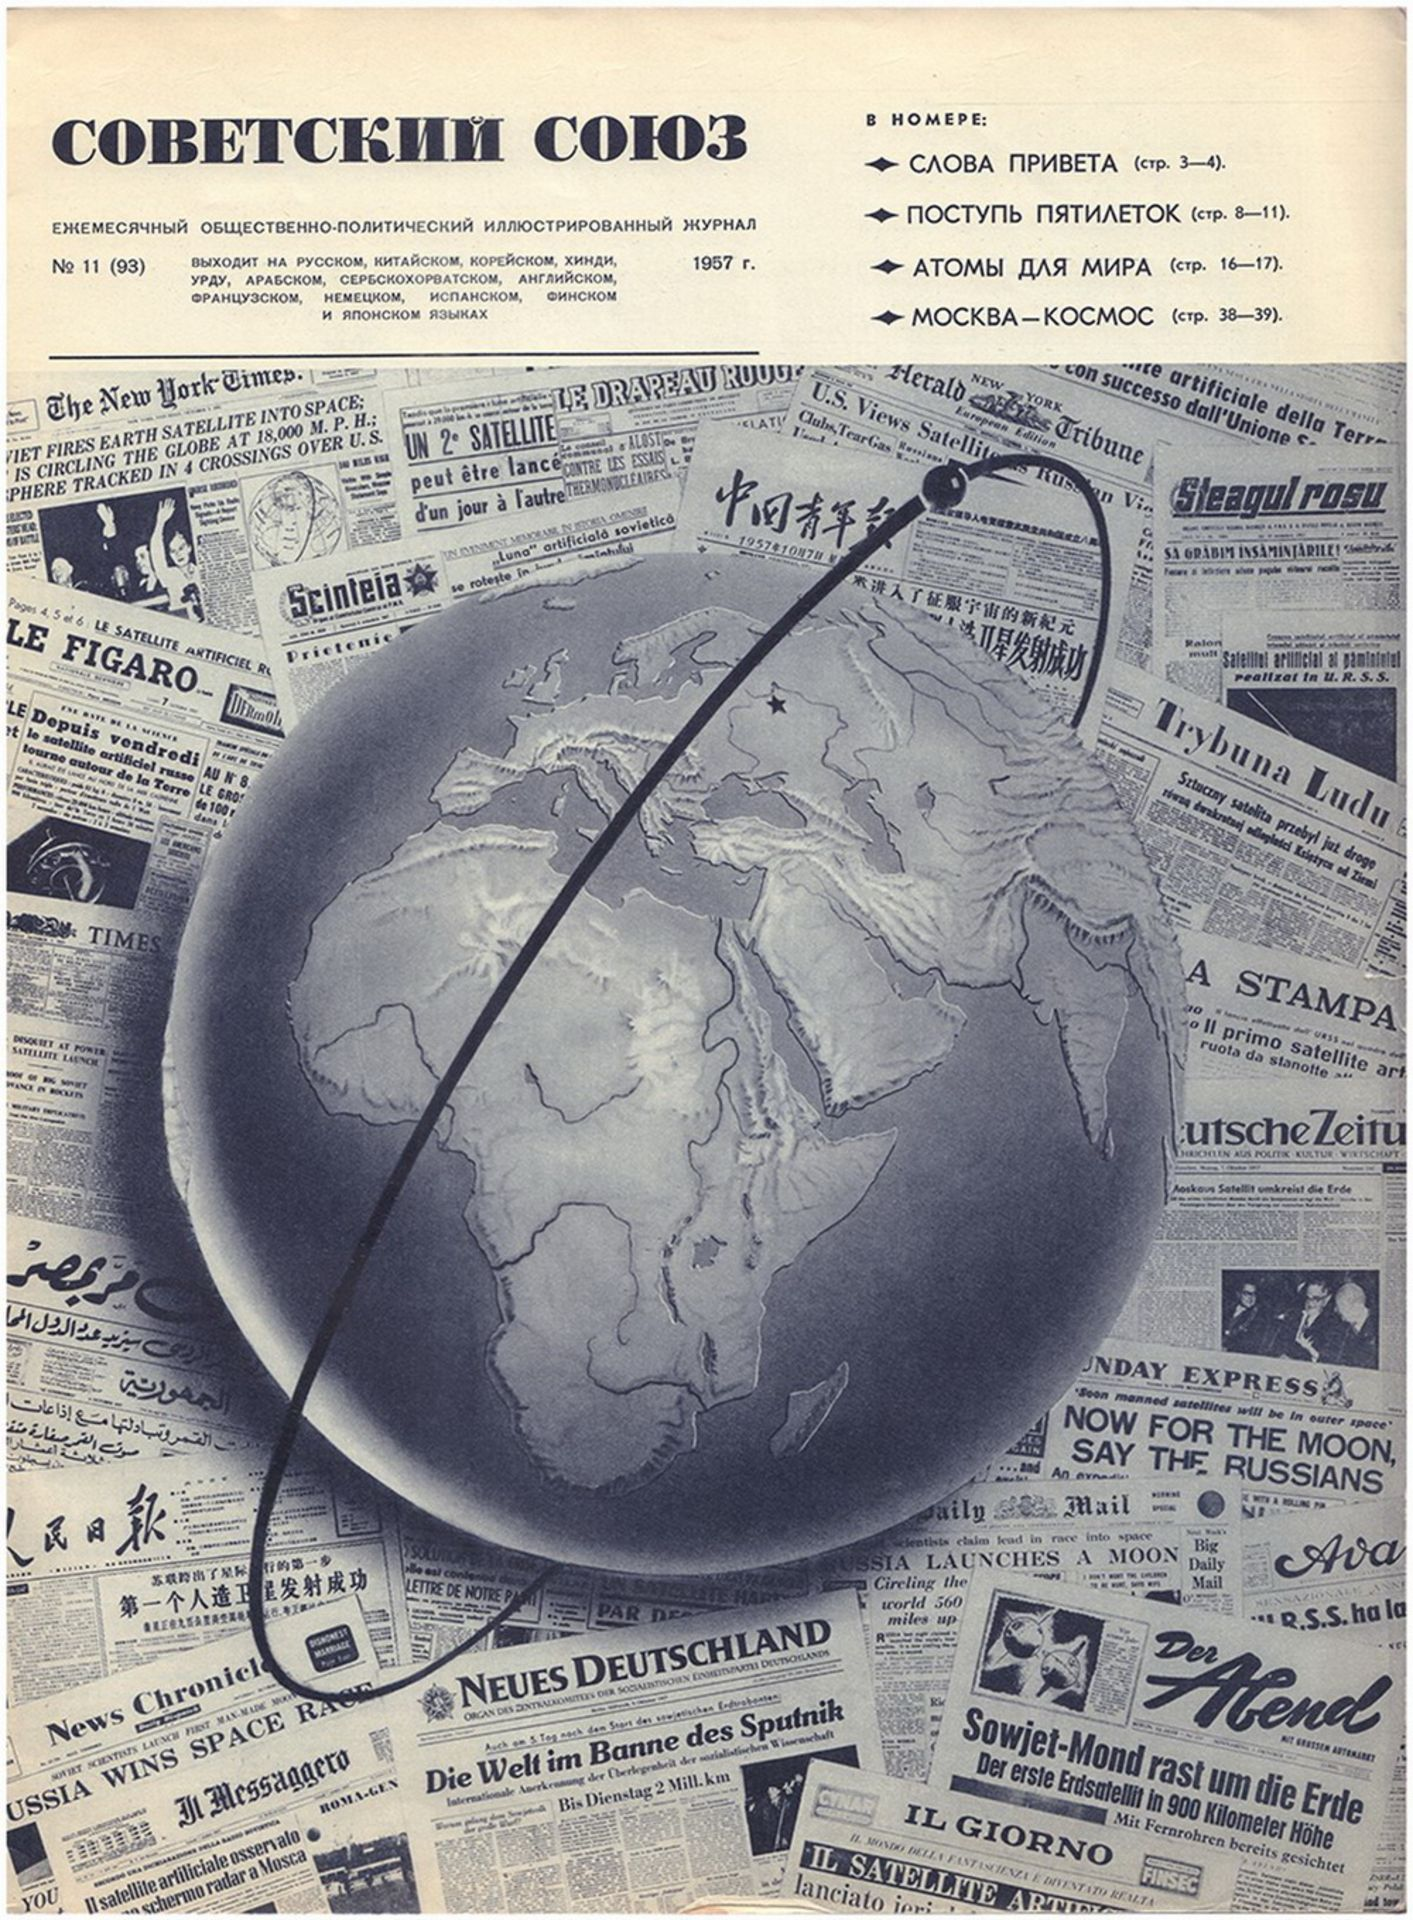 """Soviet Union"": Magazine. 11th (93) Anniversary Issue. Moscow, 1957. 40 pp.: ill.; 40x30 cm. <br>Ori - Bild 2 aus 5"